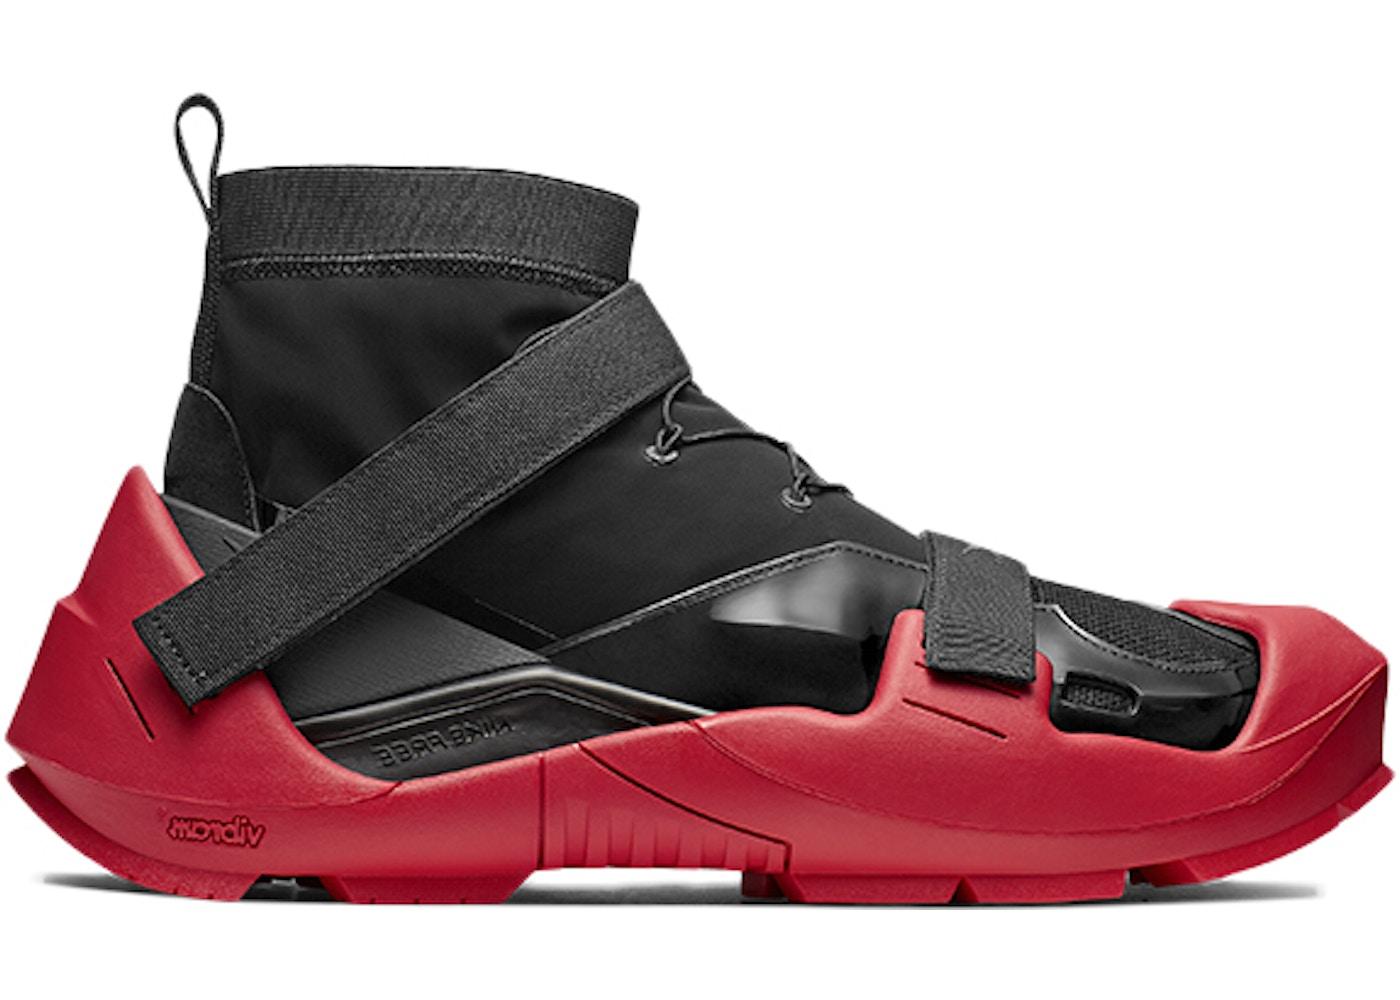 promo code 3a55f 777a1 Nike Free TR 3 SP MMW Bred - AQ9200-001